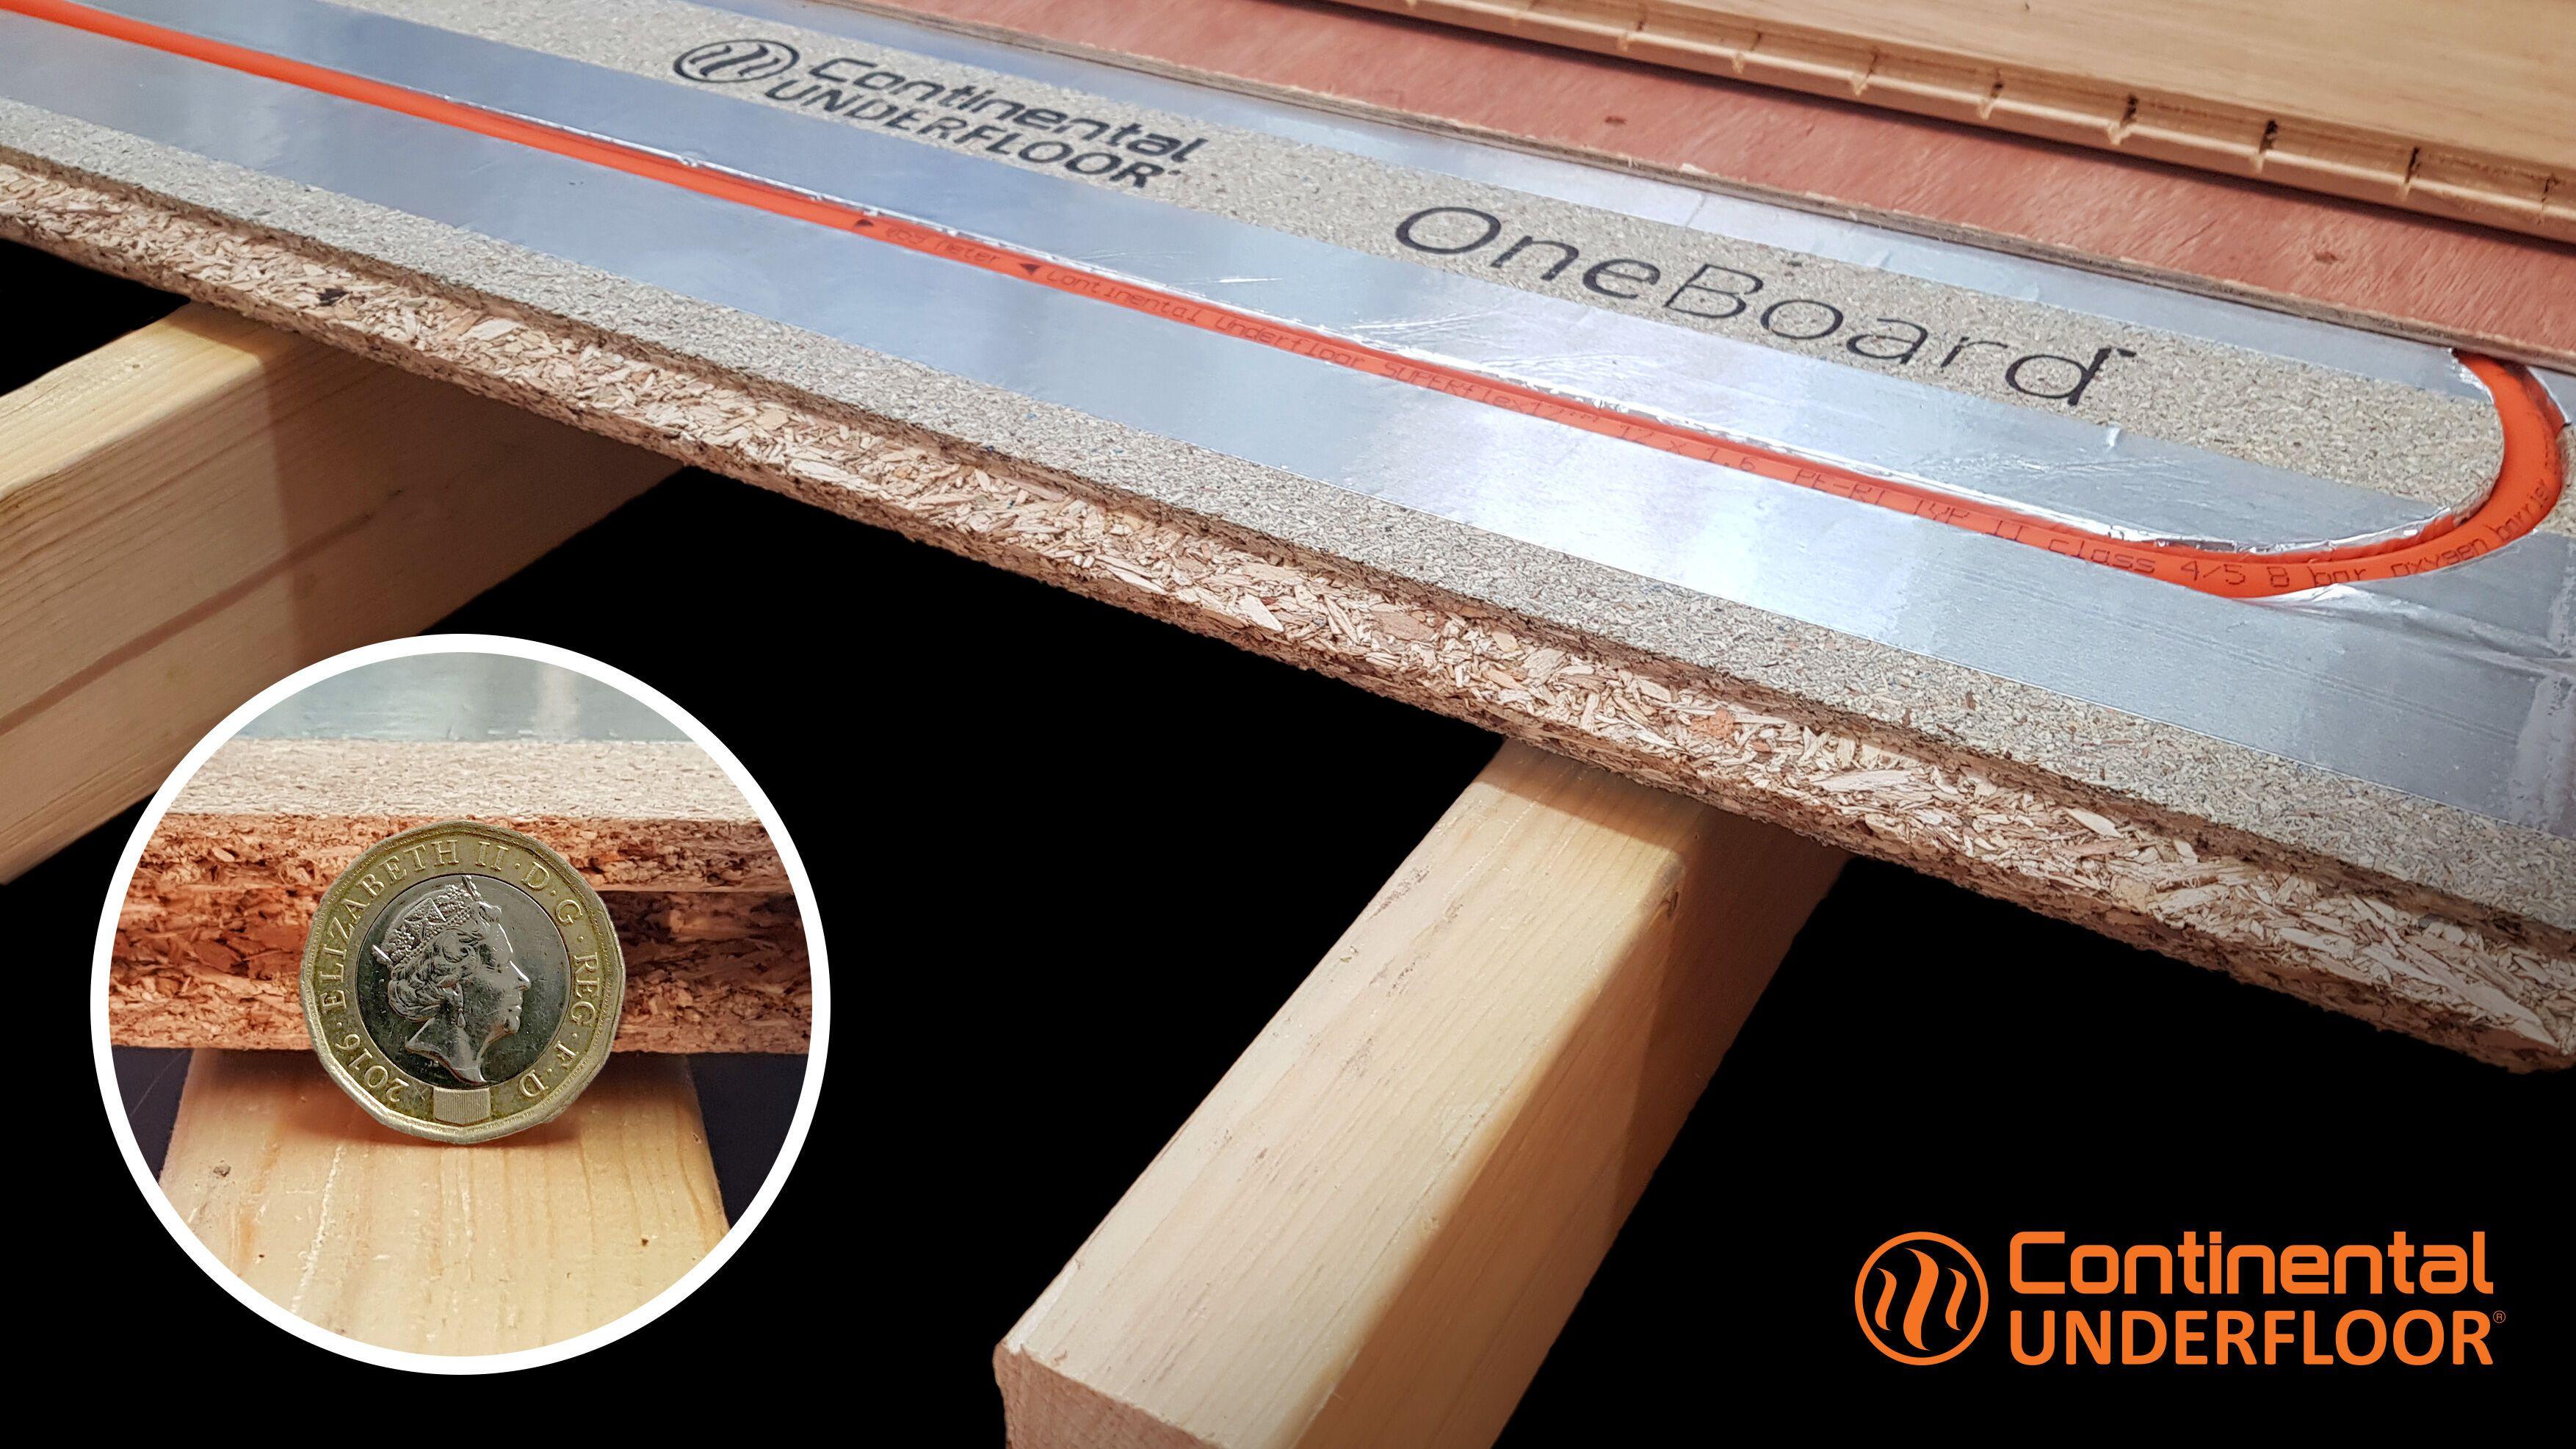 Underfloor Heating Systems